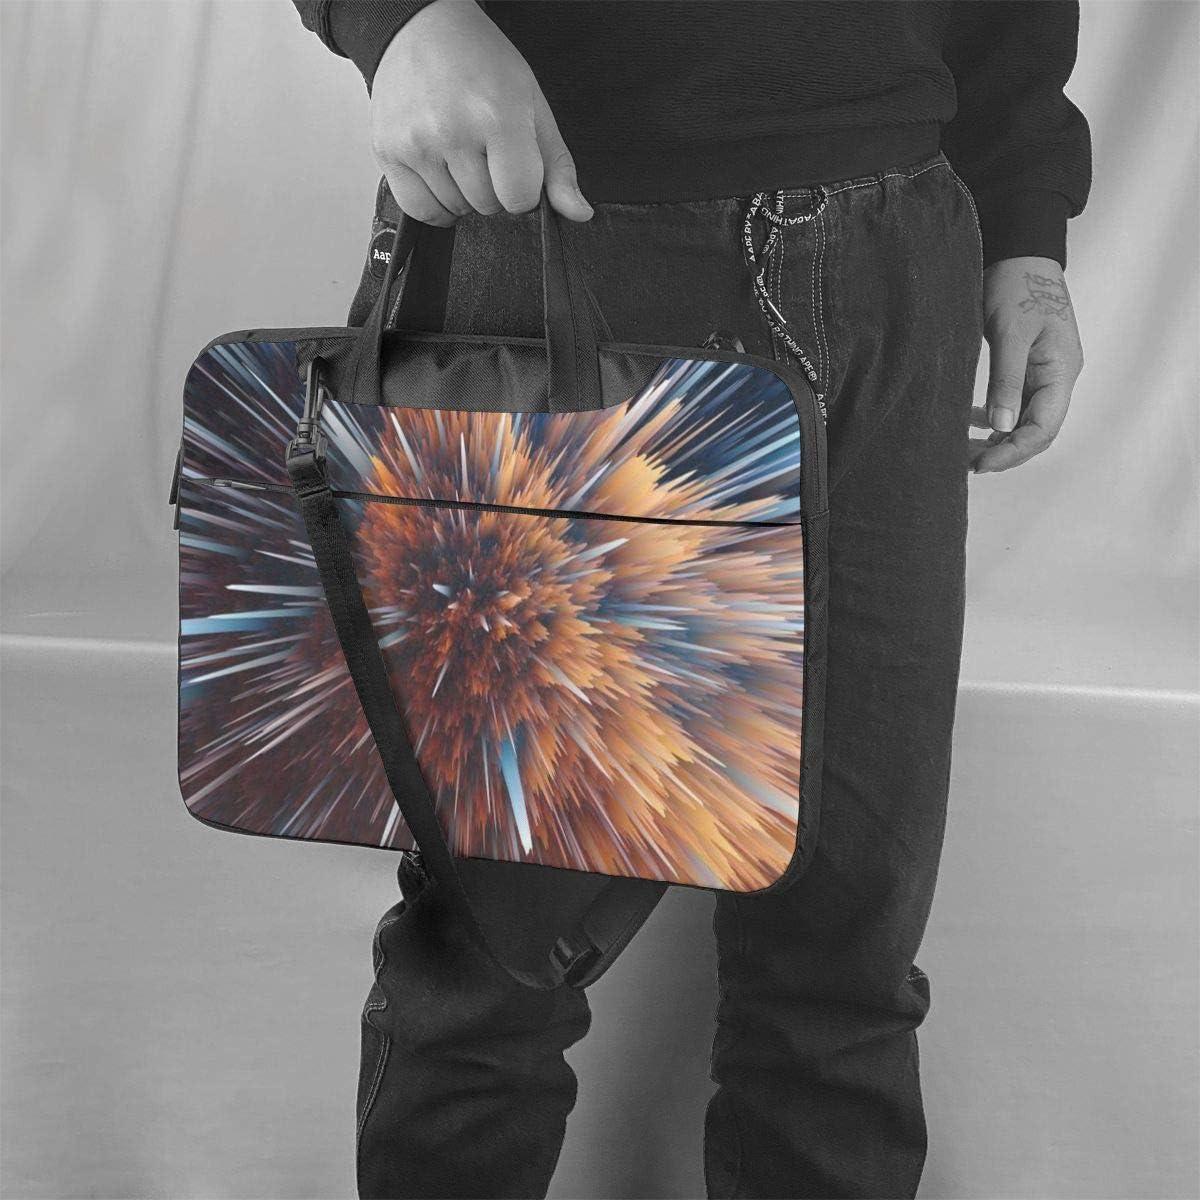 Teesofun Laptop Bag Handheld Business Briefcase Protective Bag for 13 Inch MacBook Air//Pro Abstract Peacock Seamless Art Waterproof Laptop Shoulder Messenger Bag